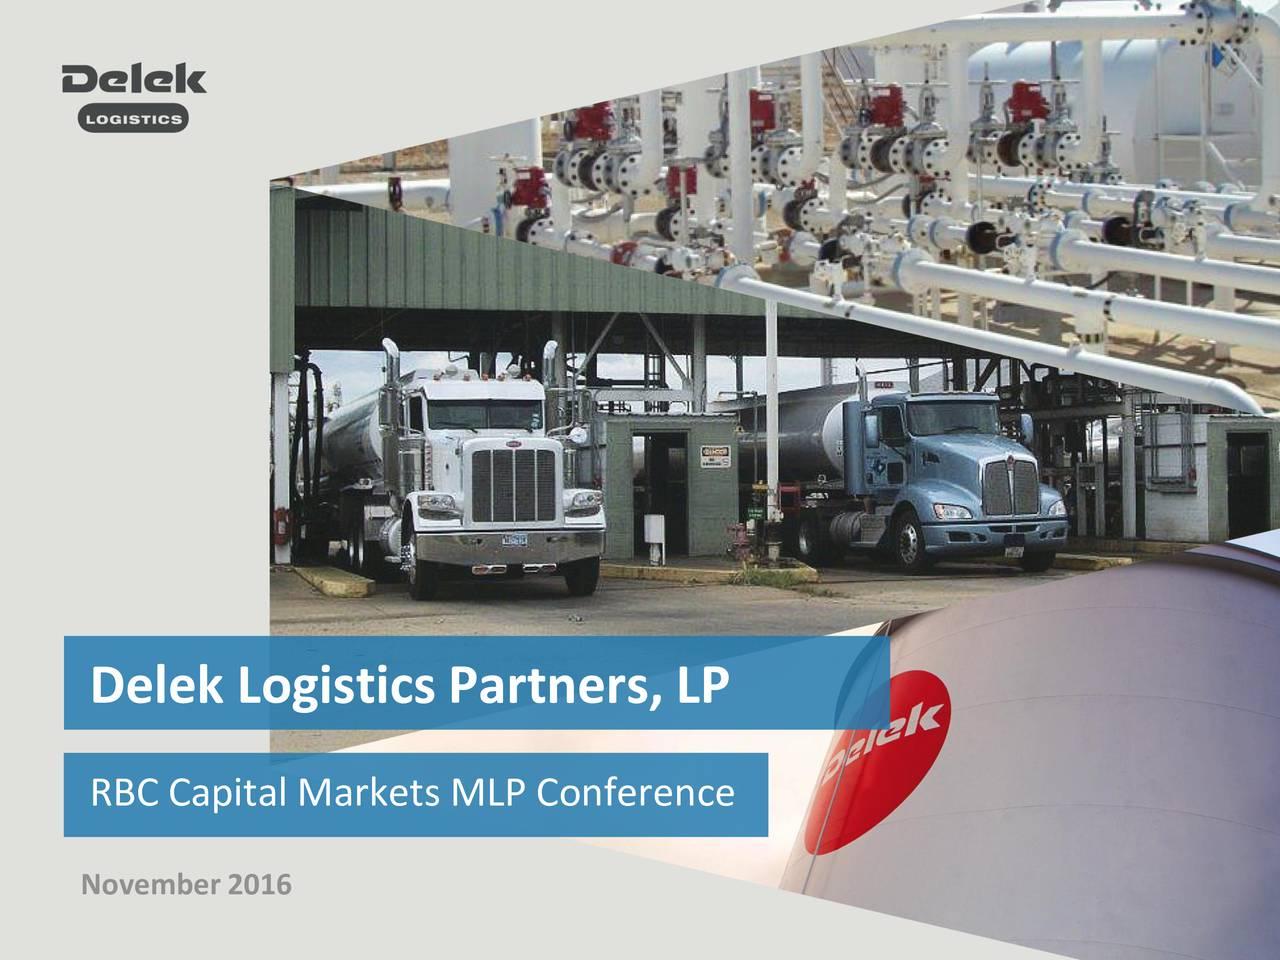 RBC Capital Markets MLP Conference November 2016